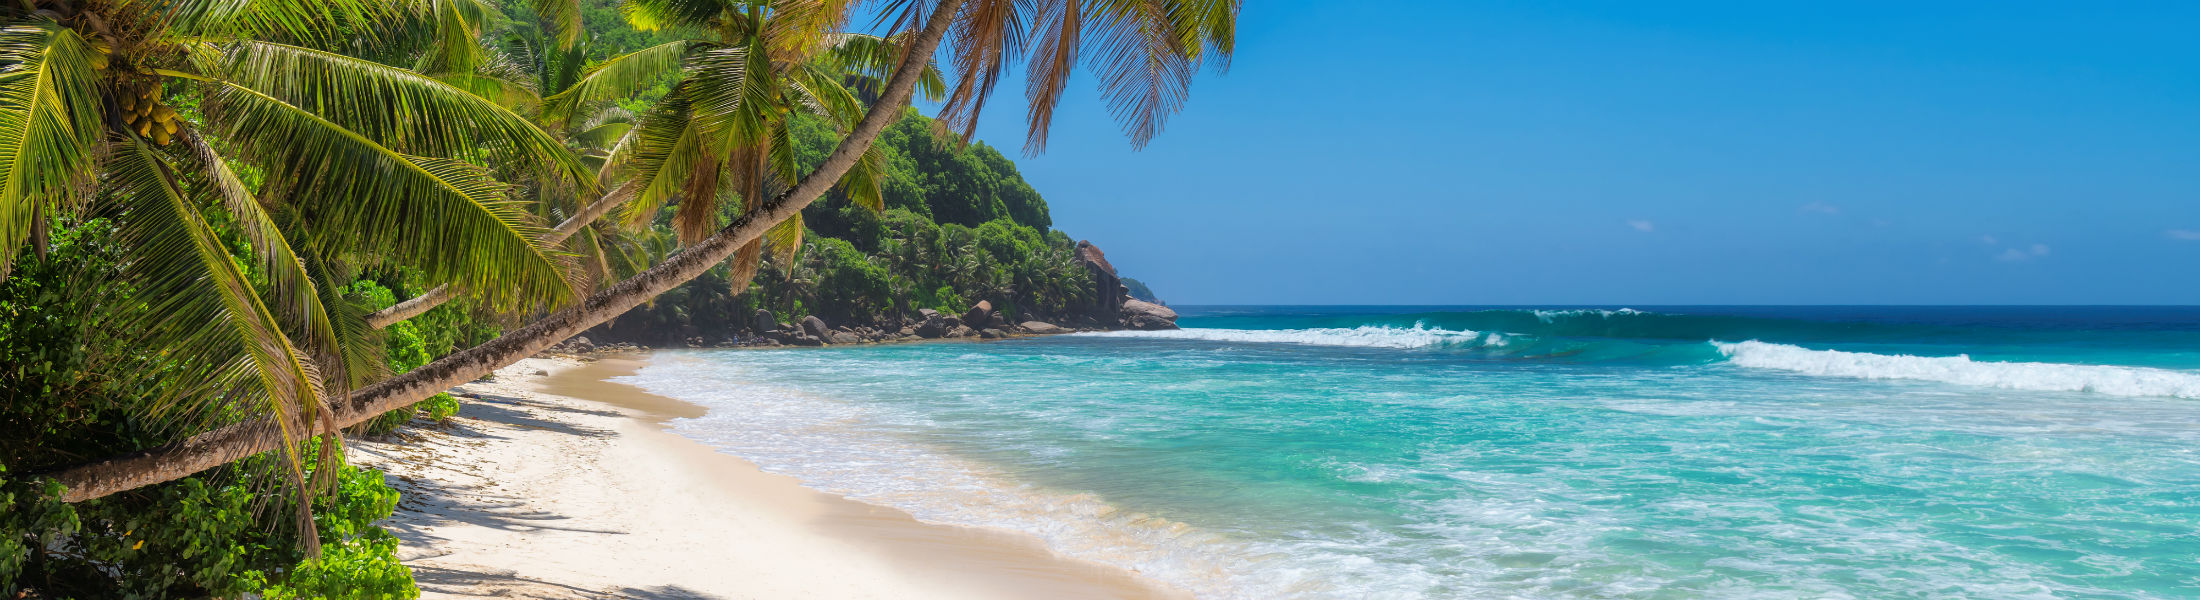 Jamaica Caribbean island